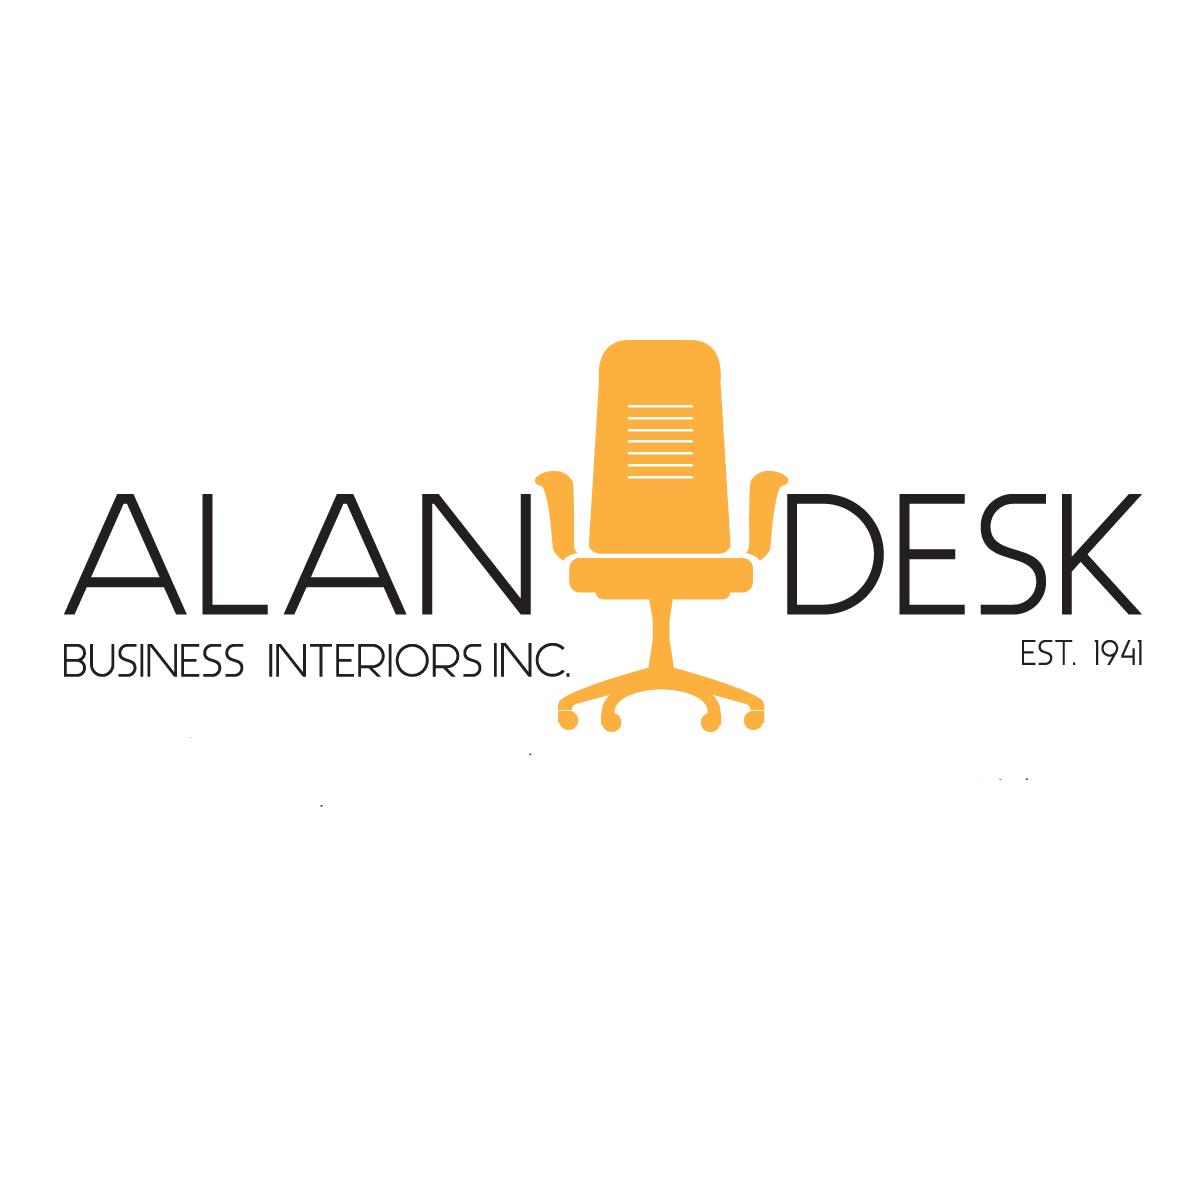 Alan Desk Business Interiors Inc.